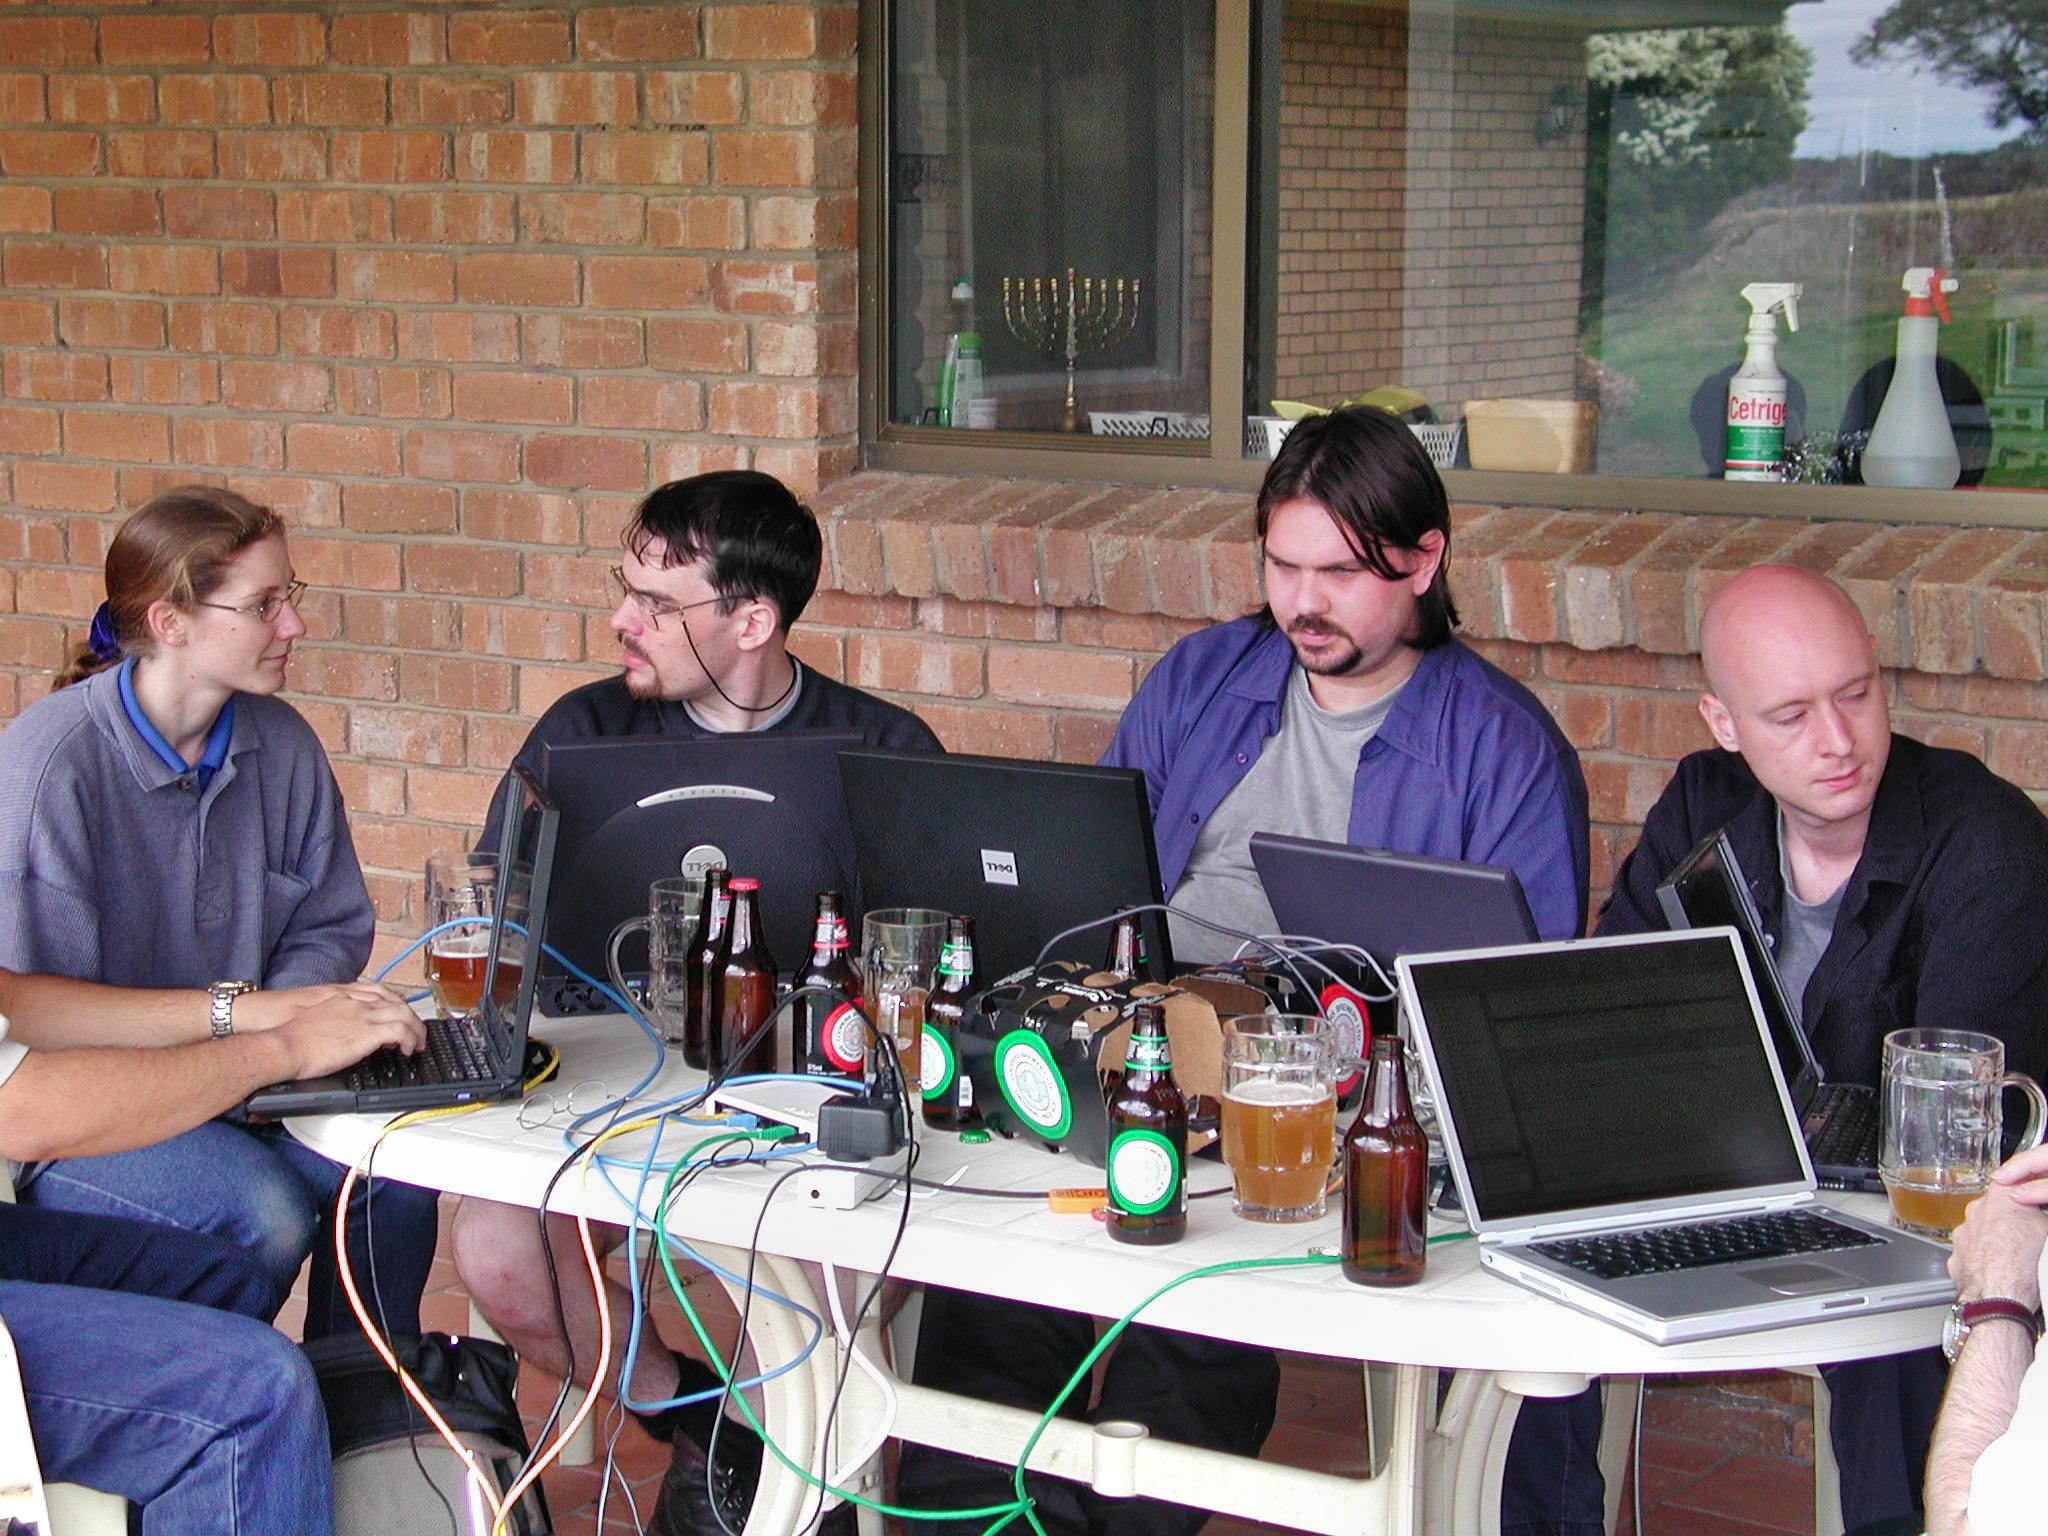 hackers-96.jpeg